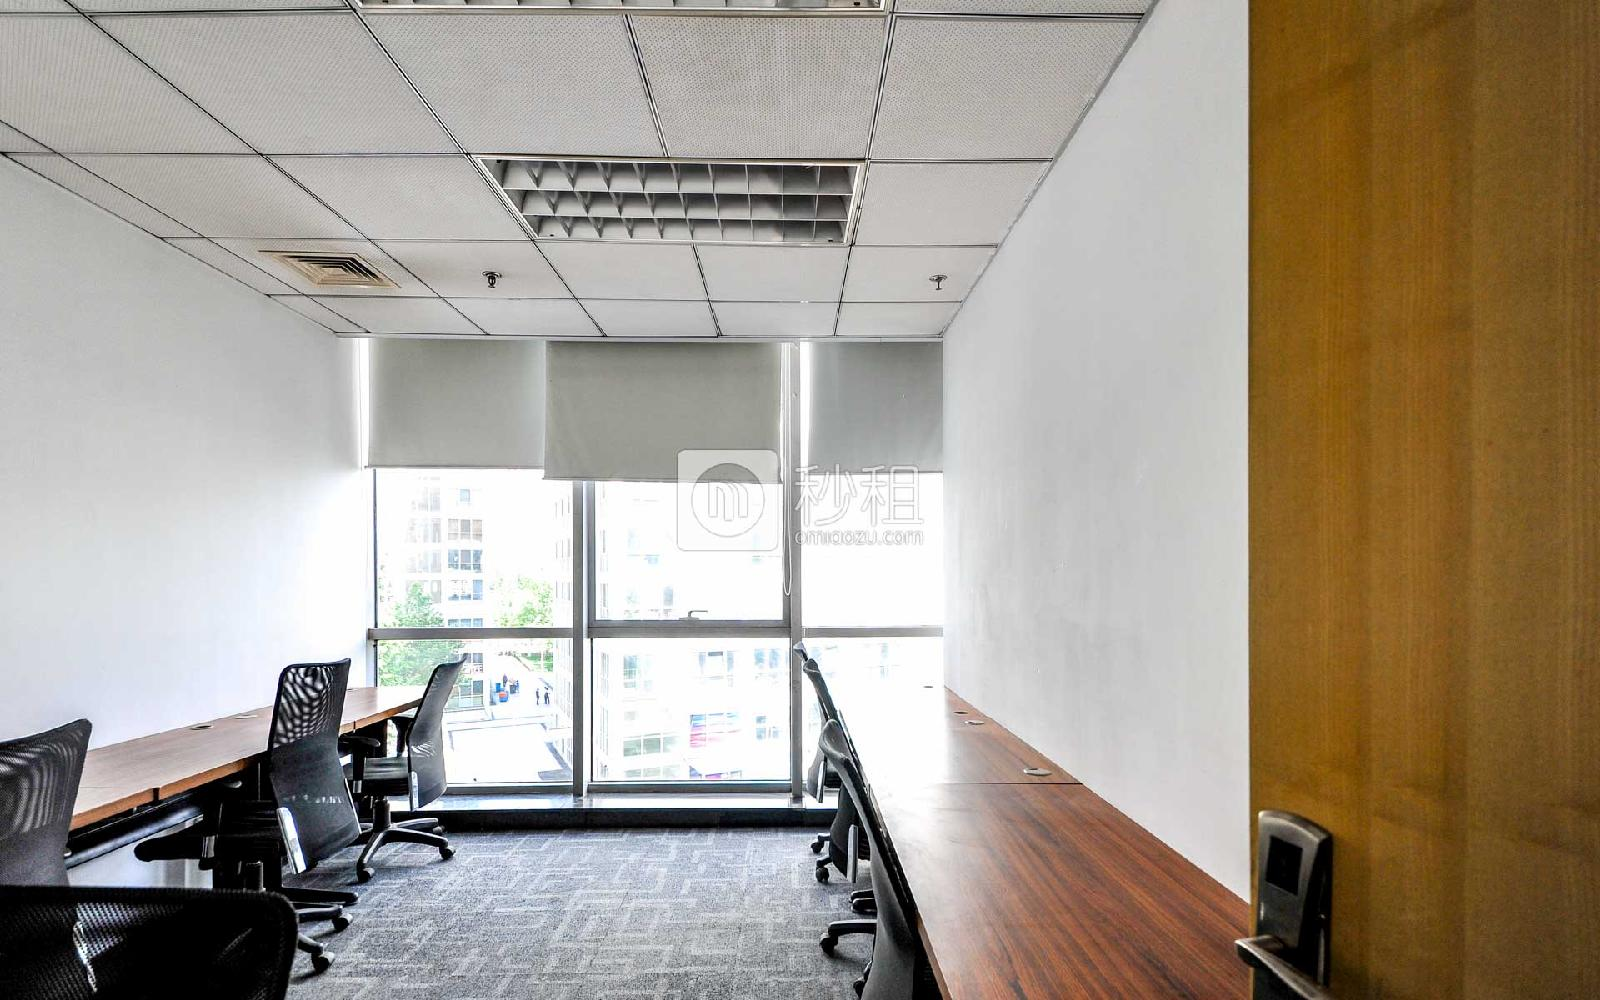 CBD国际大厦-世鳌国际商务中心写字楼出租35平米精装办公室18200元/间.月